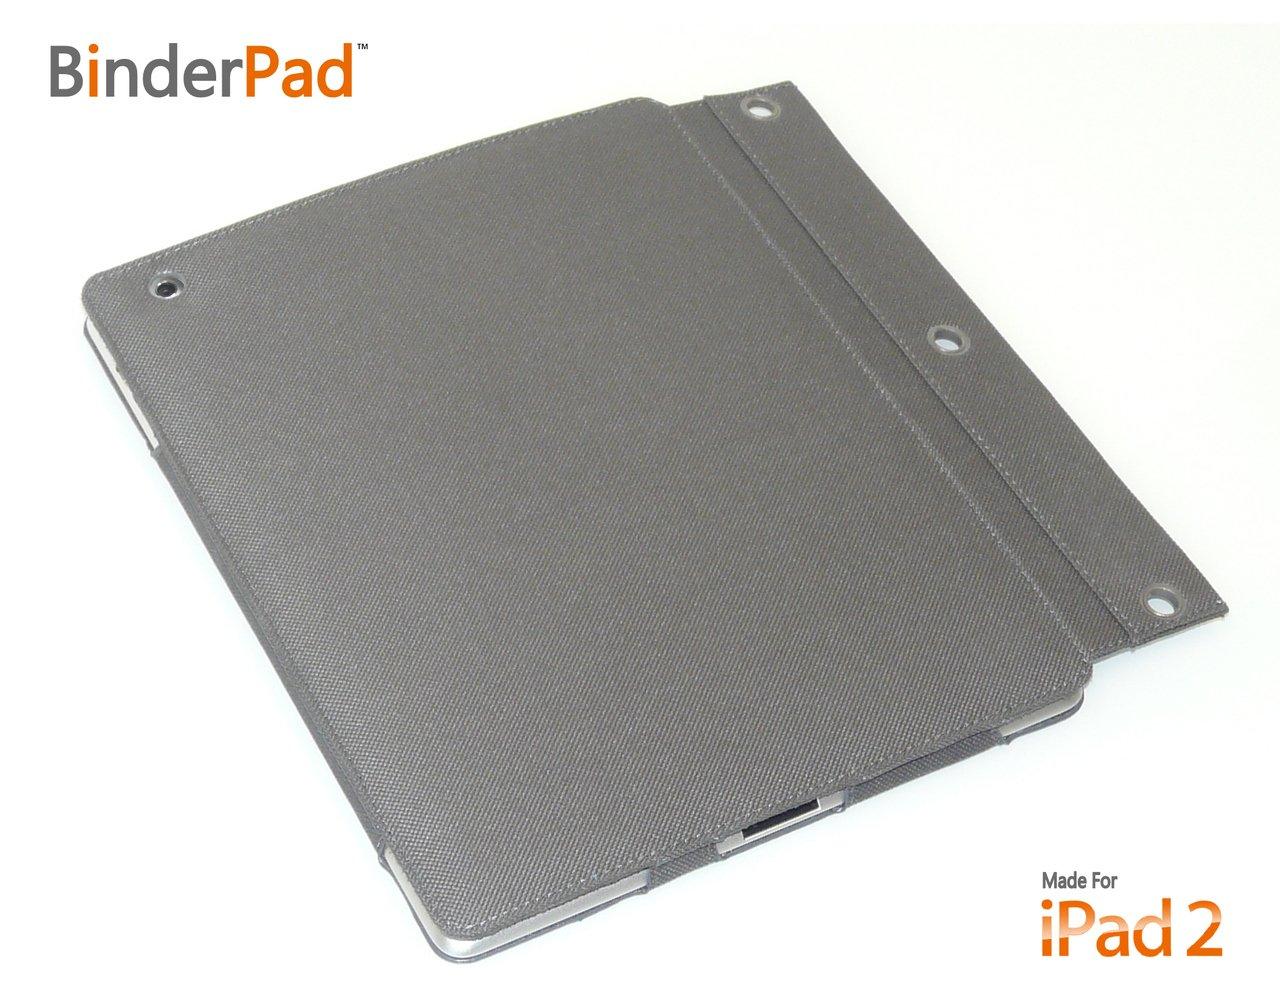 Ipad Binderpad Pouch Grey